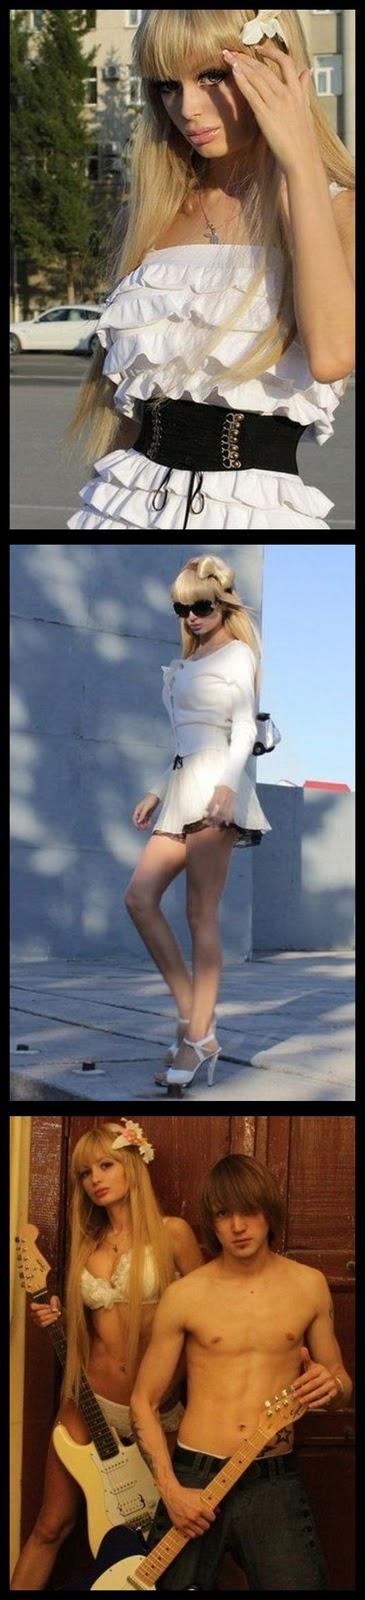 bb-kaskus.blogspot.com - Ini cewek beneran atau boneka barbie??